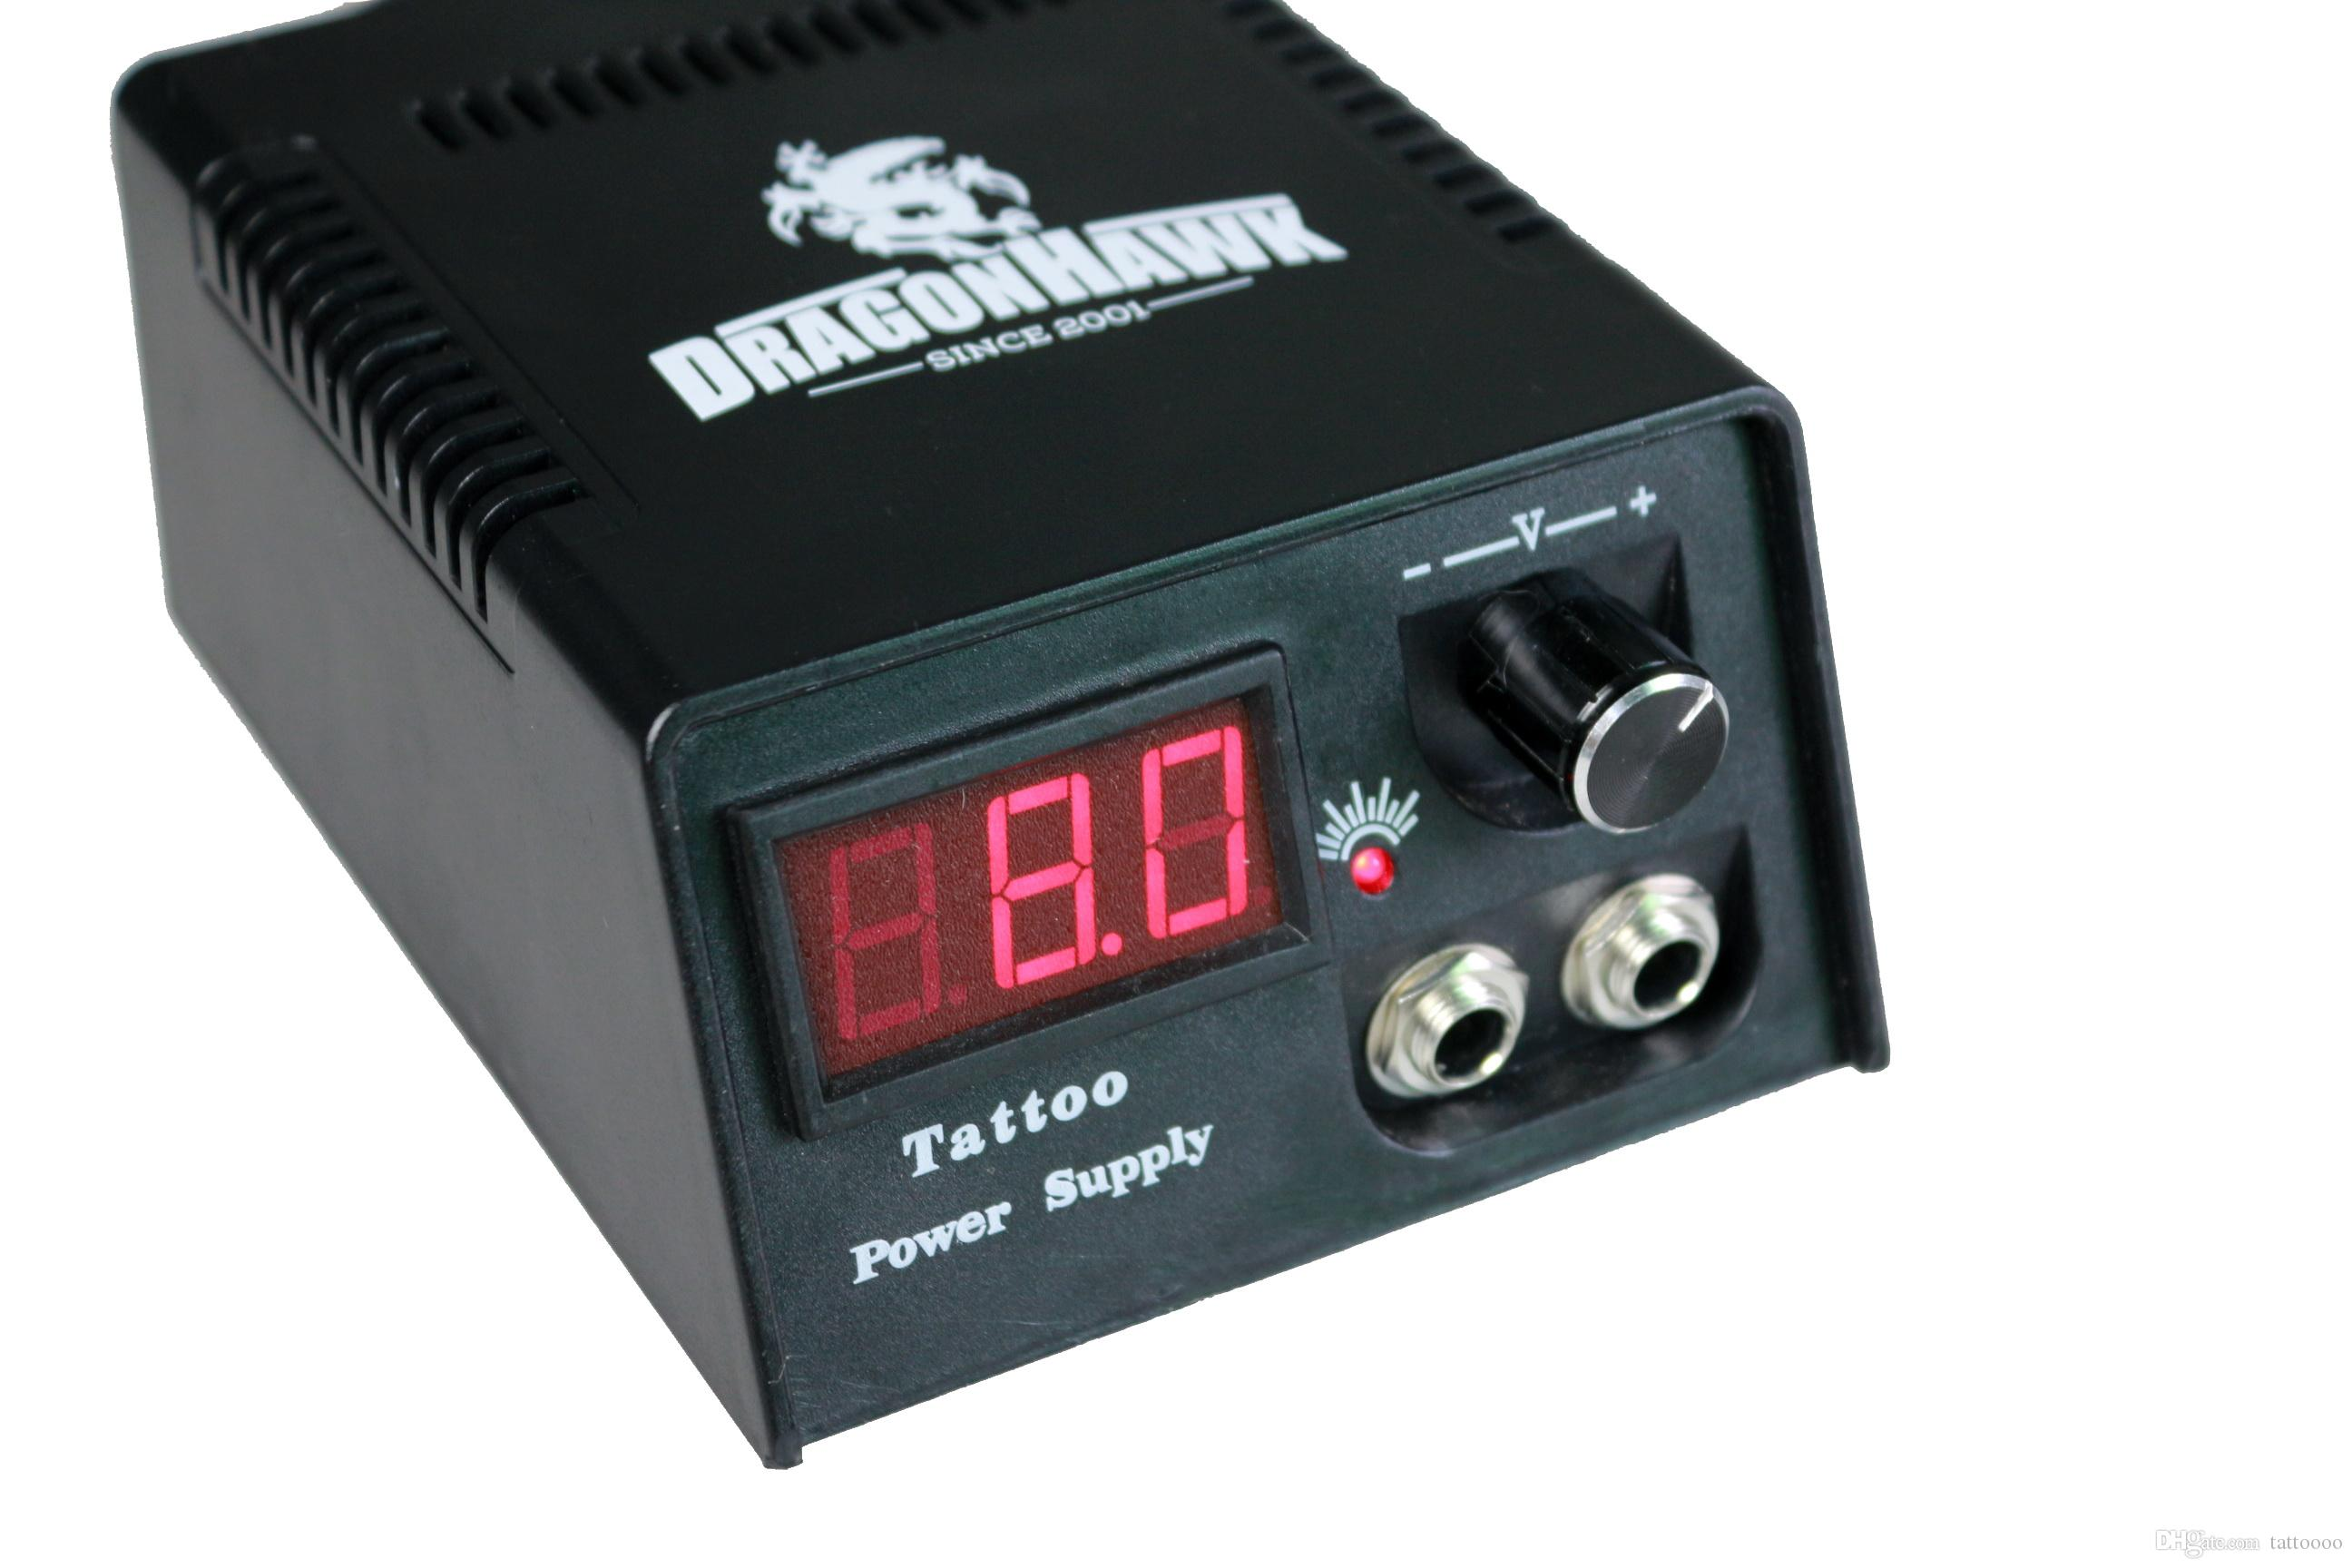 LCD Digital Dual Machine Tattoo Netzteil mit EU US Power Plug A ++ Qualität für Kits Guns Fußpedalclipkabel TNT Freies Verschiffen